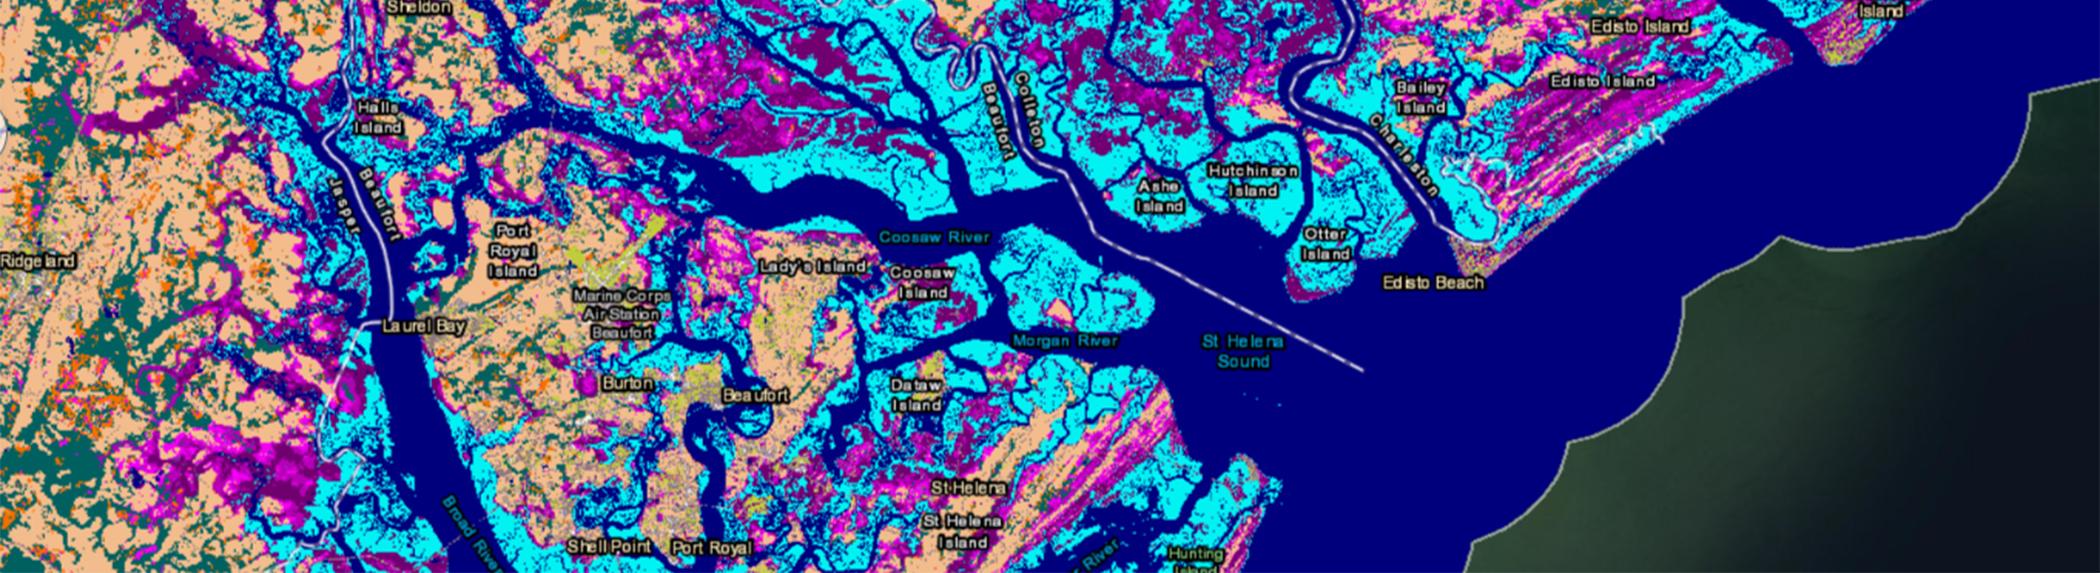 Slr wetland